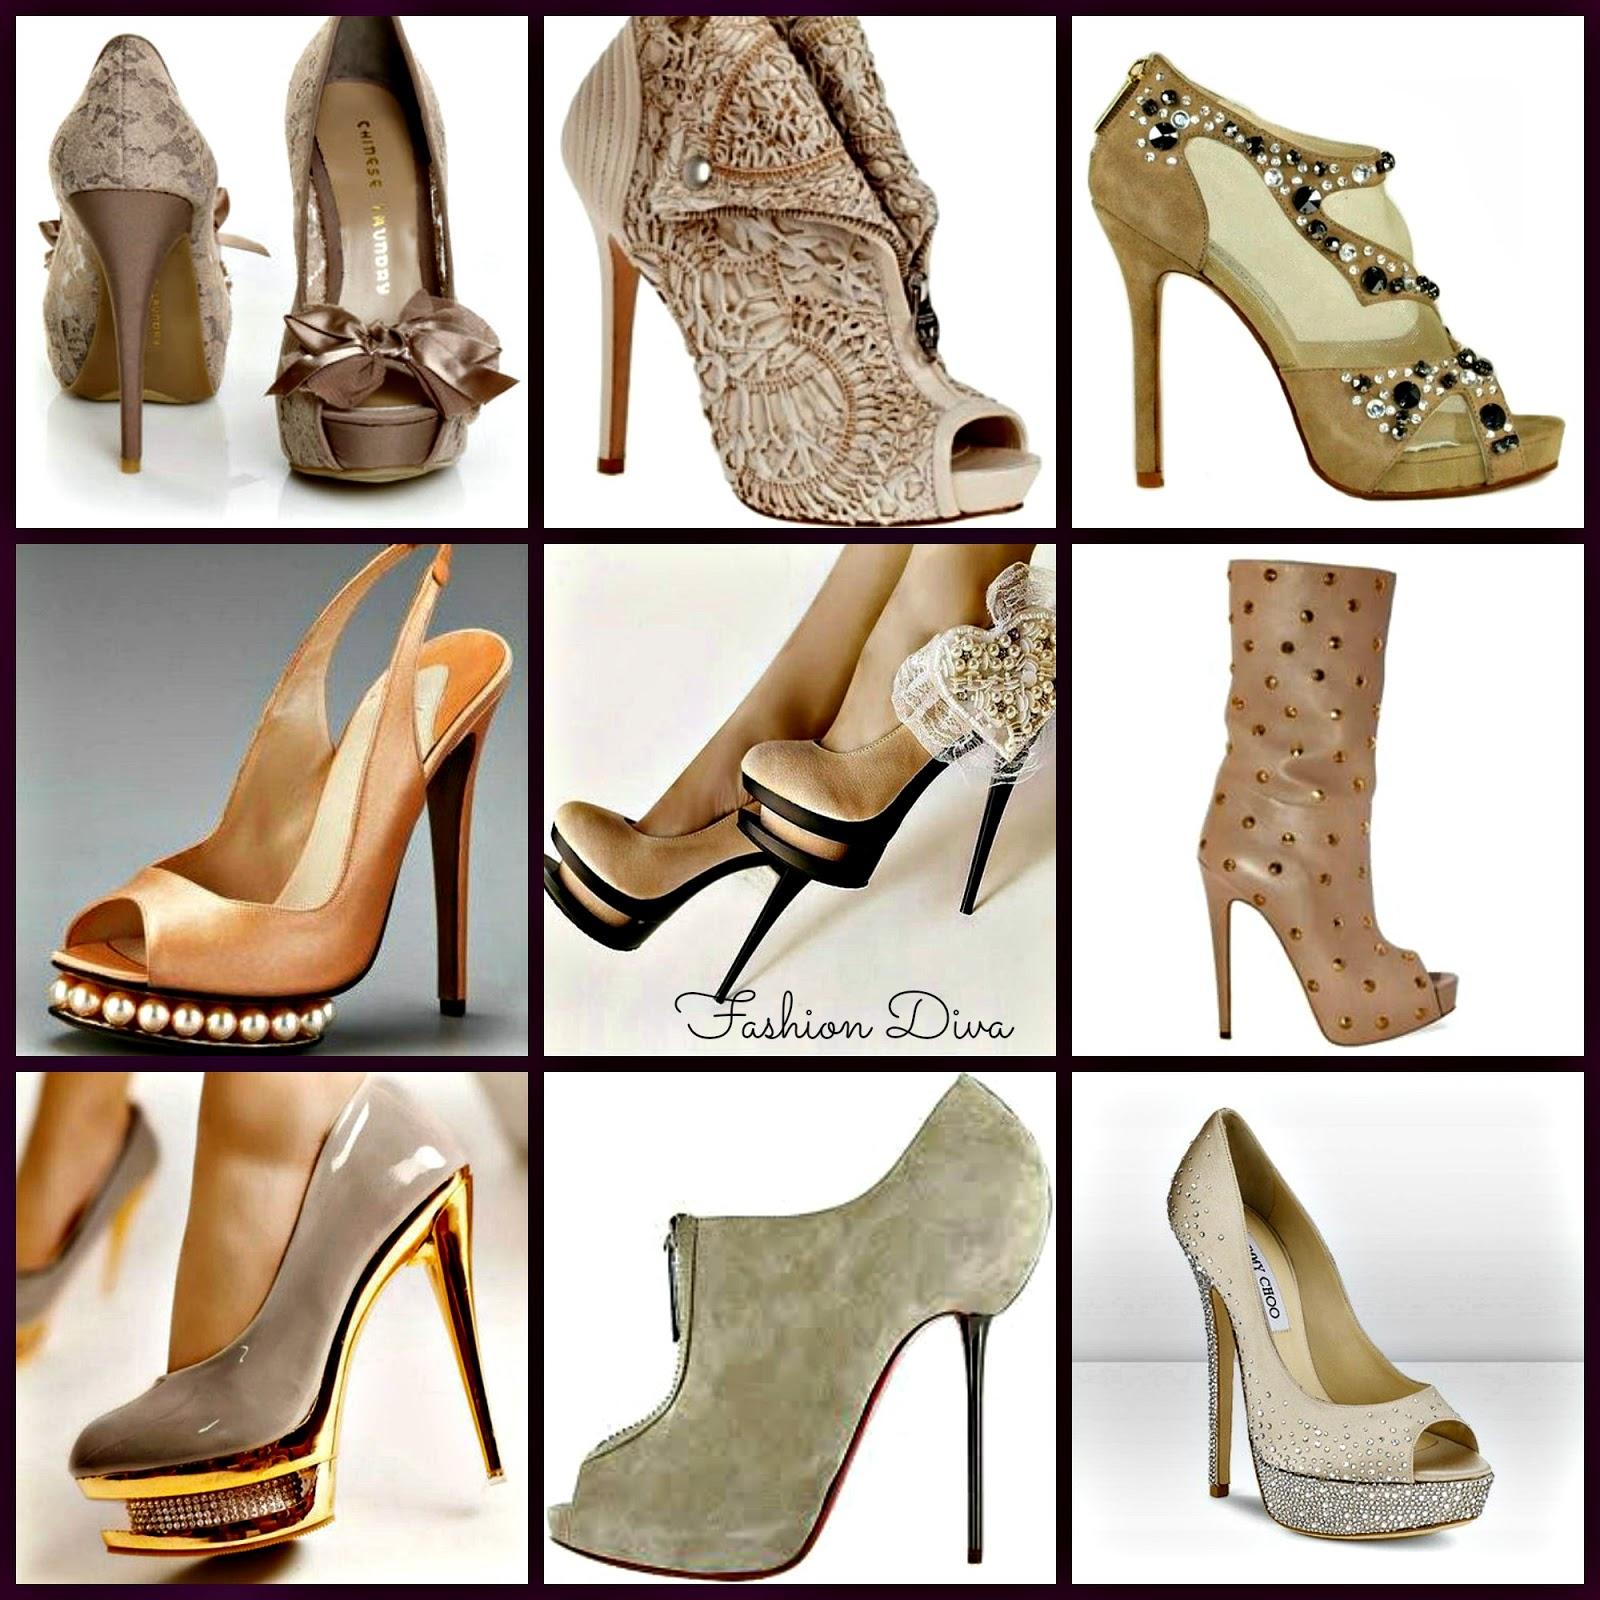 sports shoes ef8f5 65325 Come indossare scarpe beige | Notizie.it